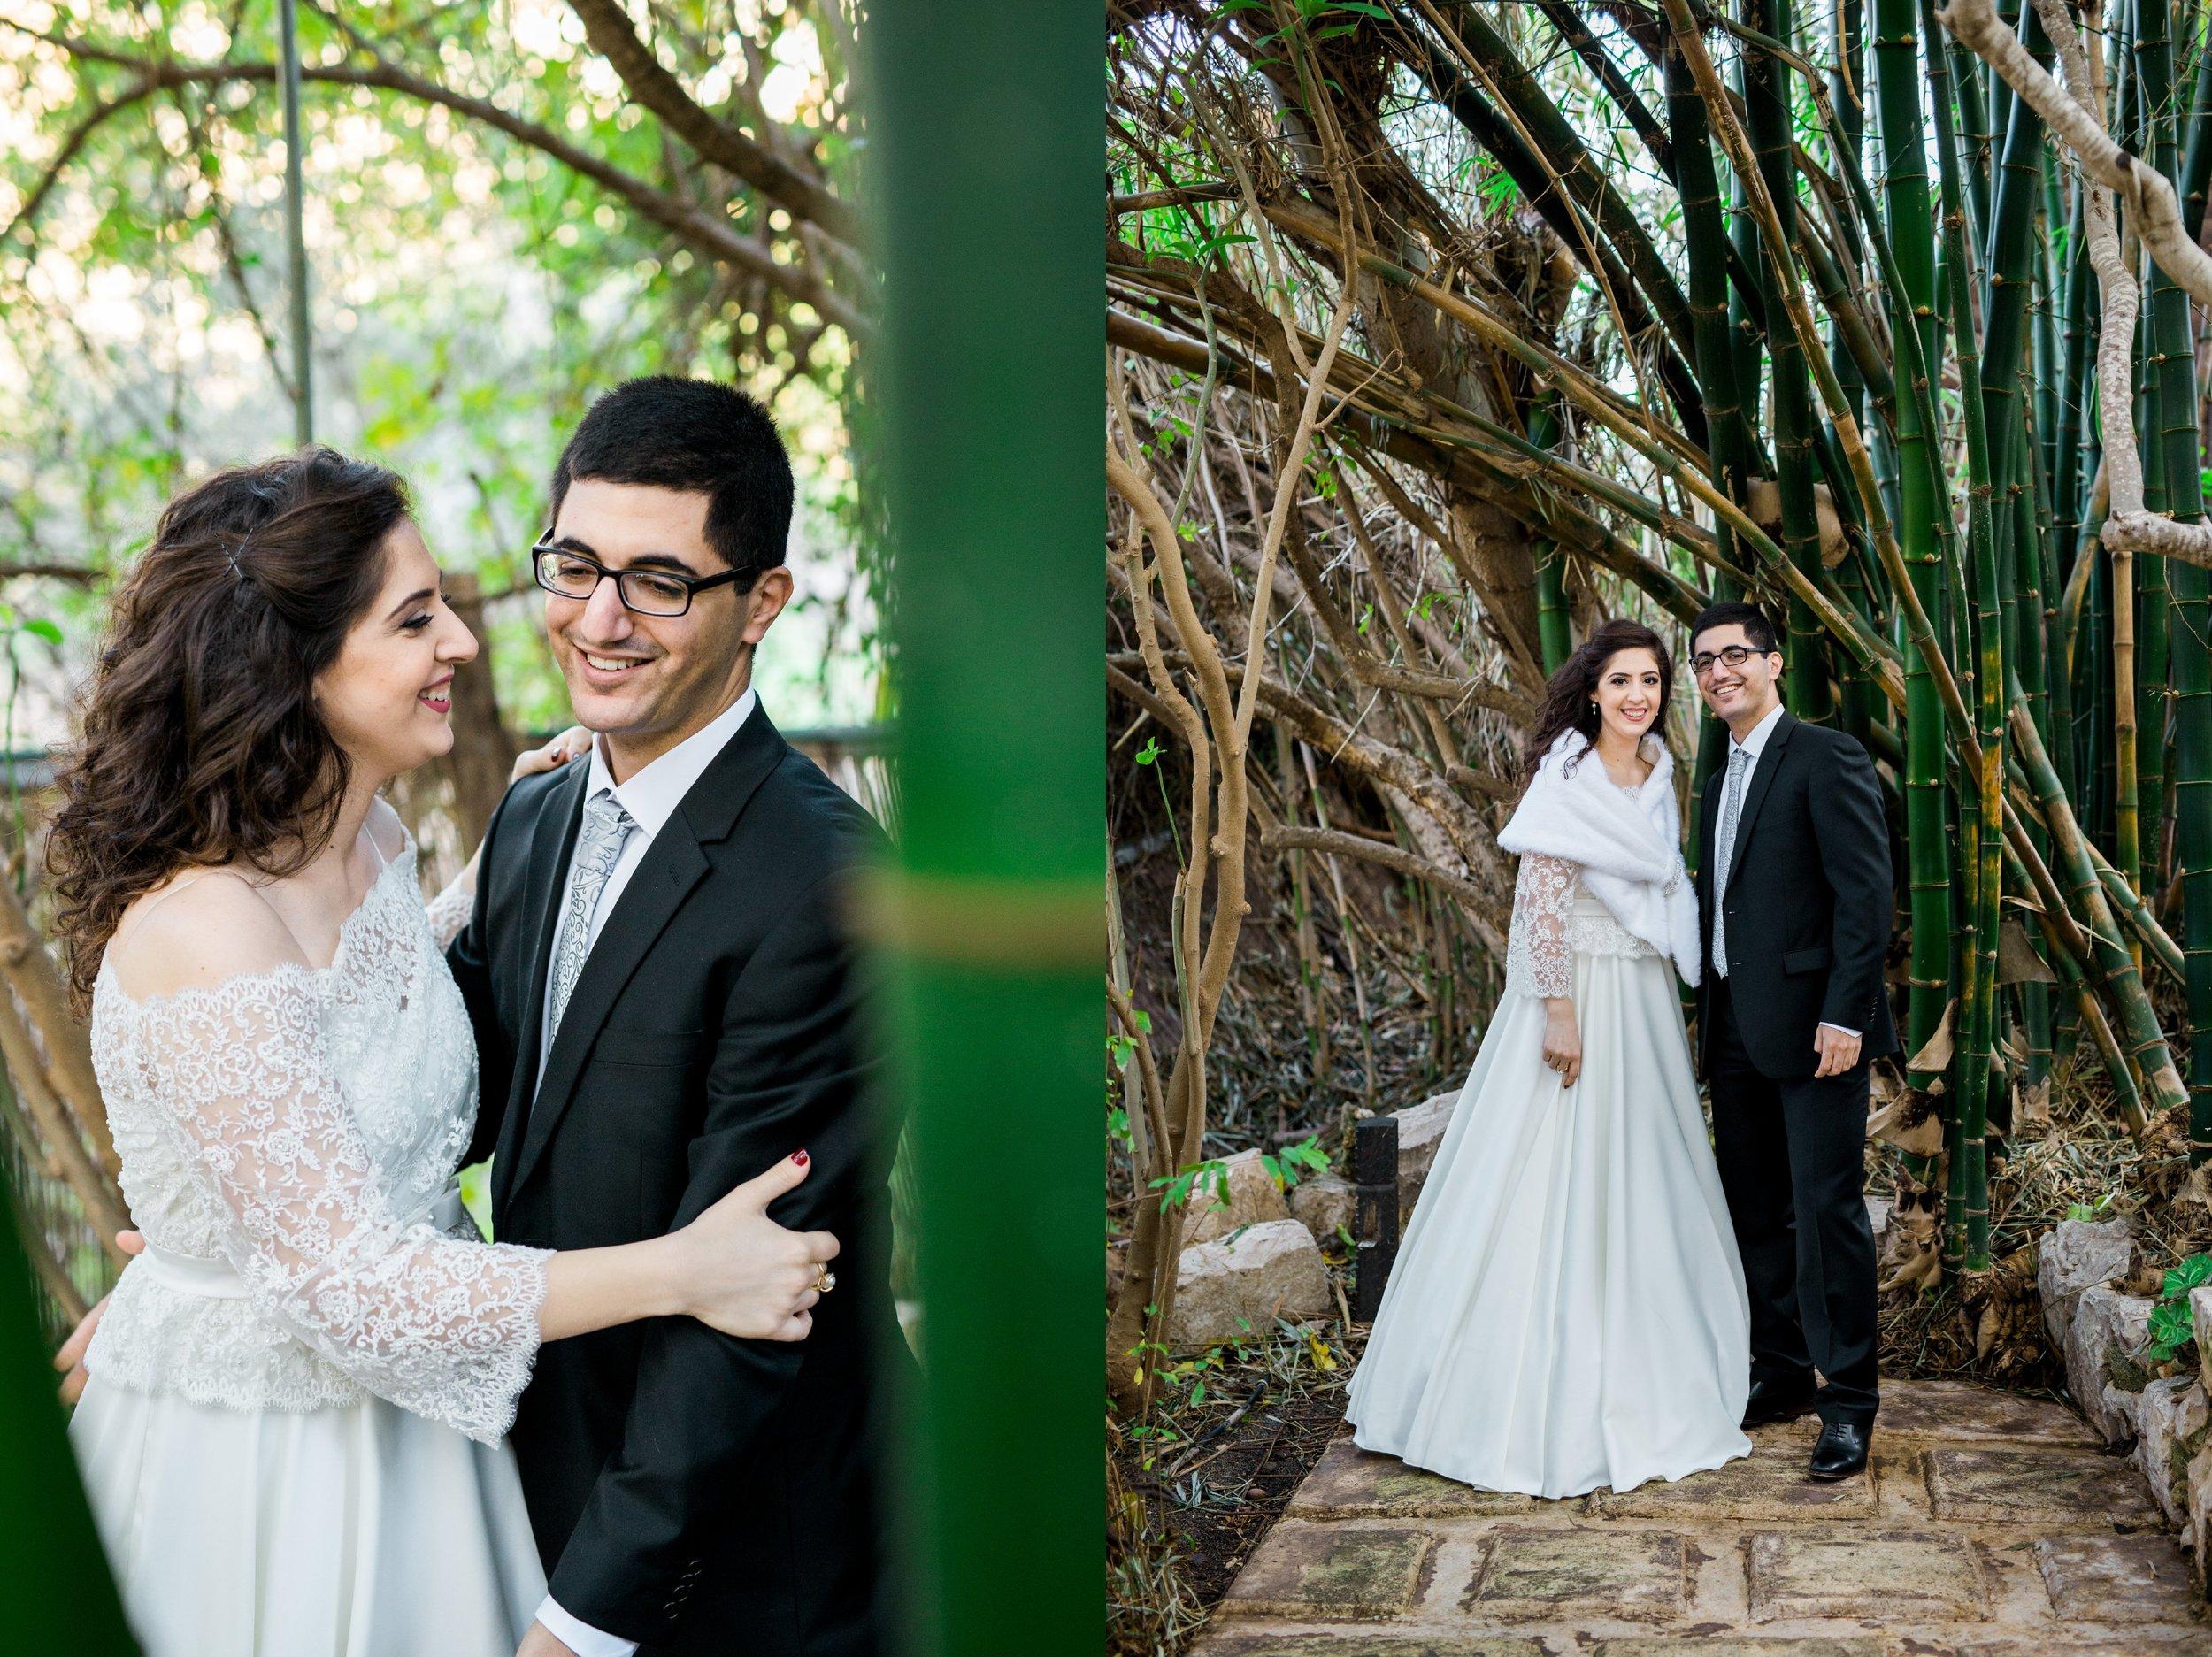 israel-garden-wedding-portraits-session-kate-giryes-photography--36_WEB.jpg